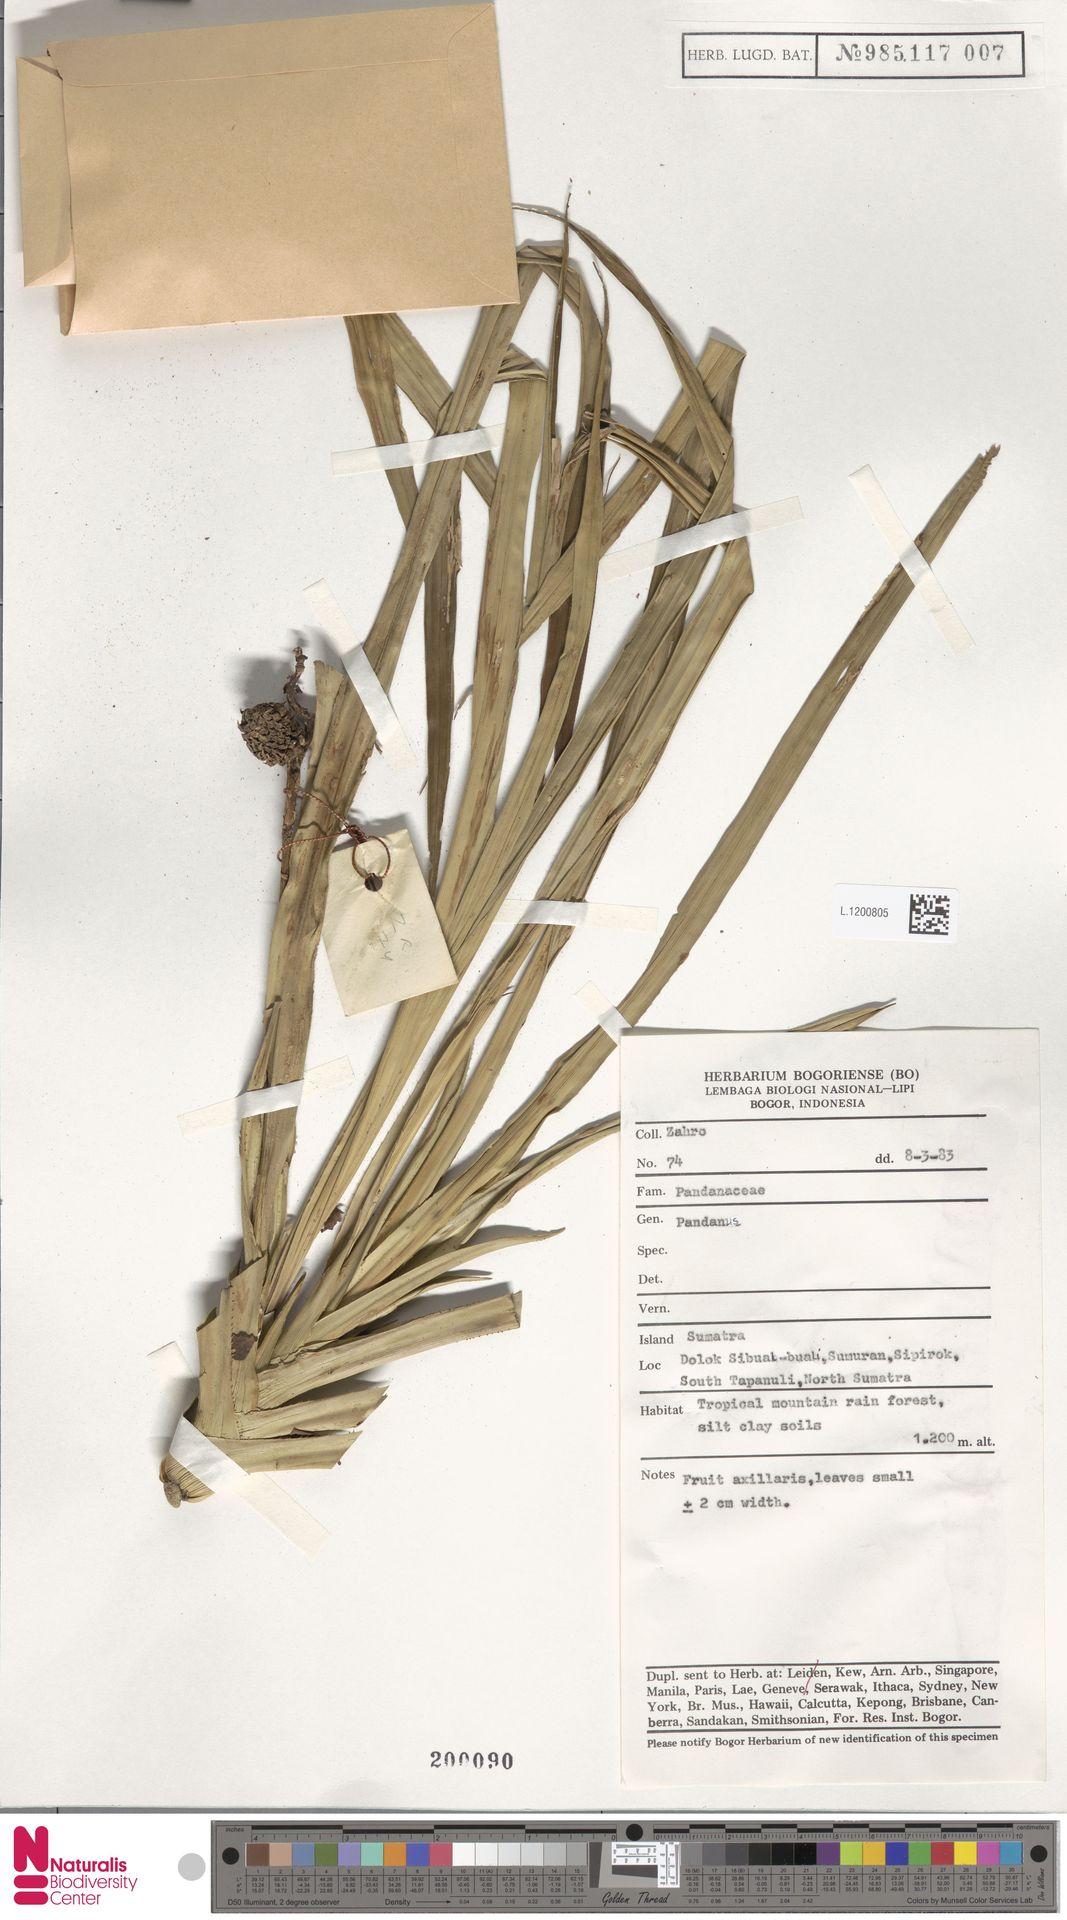 L.1200805   Benstonea korthalsii (Solms) Callm. & Buerki